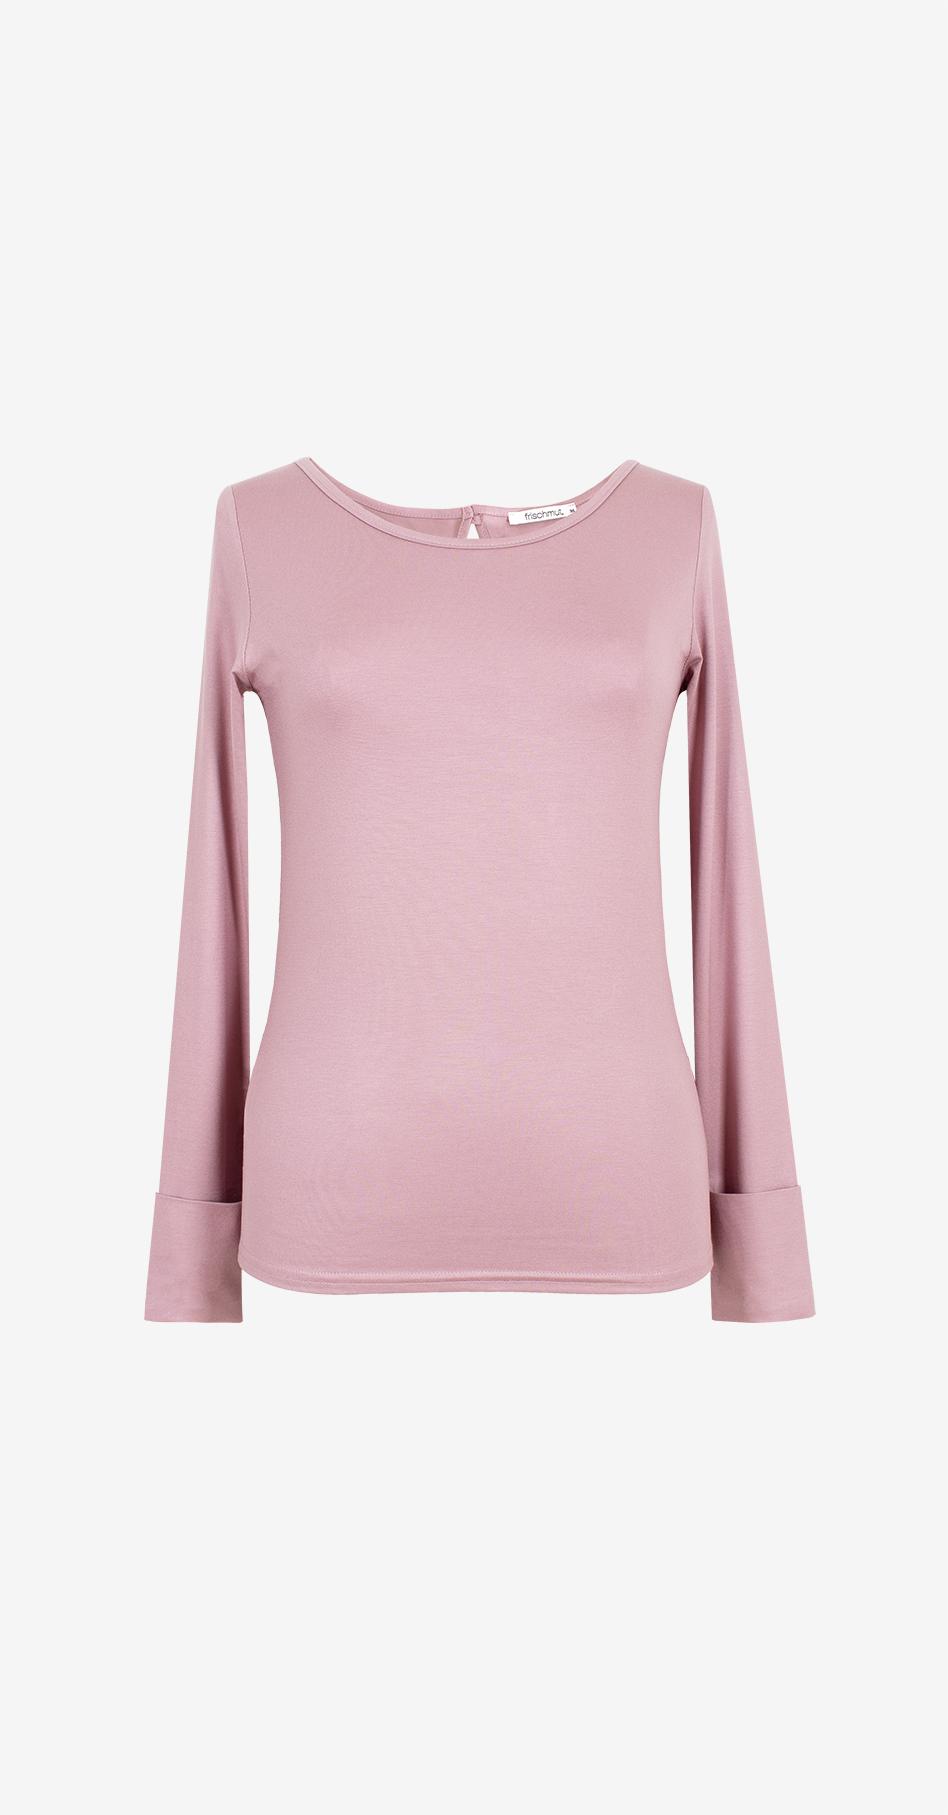 Shirt Mia/ langarm/ mauve